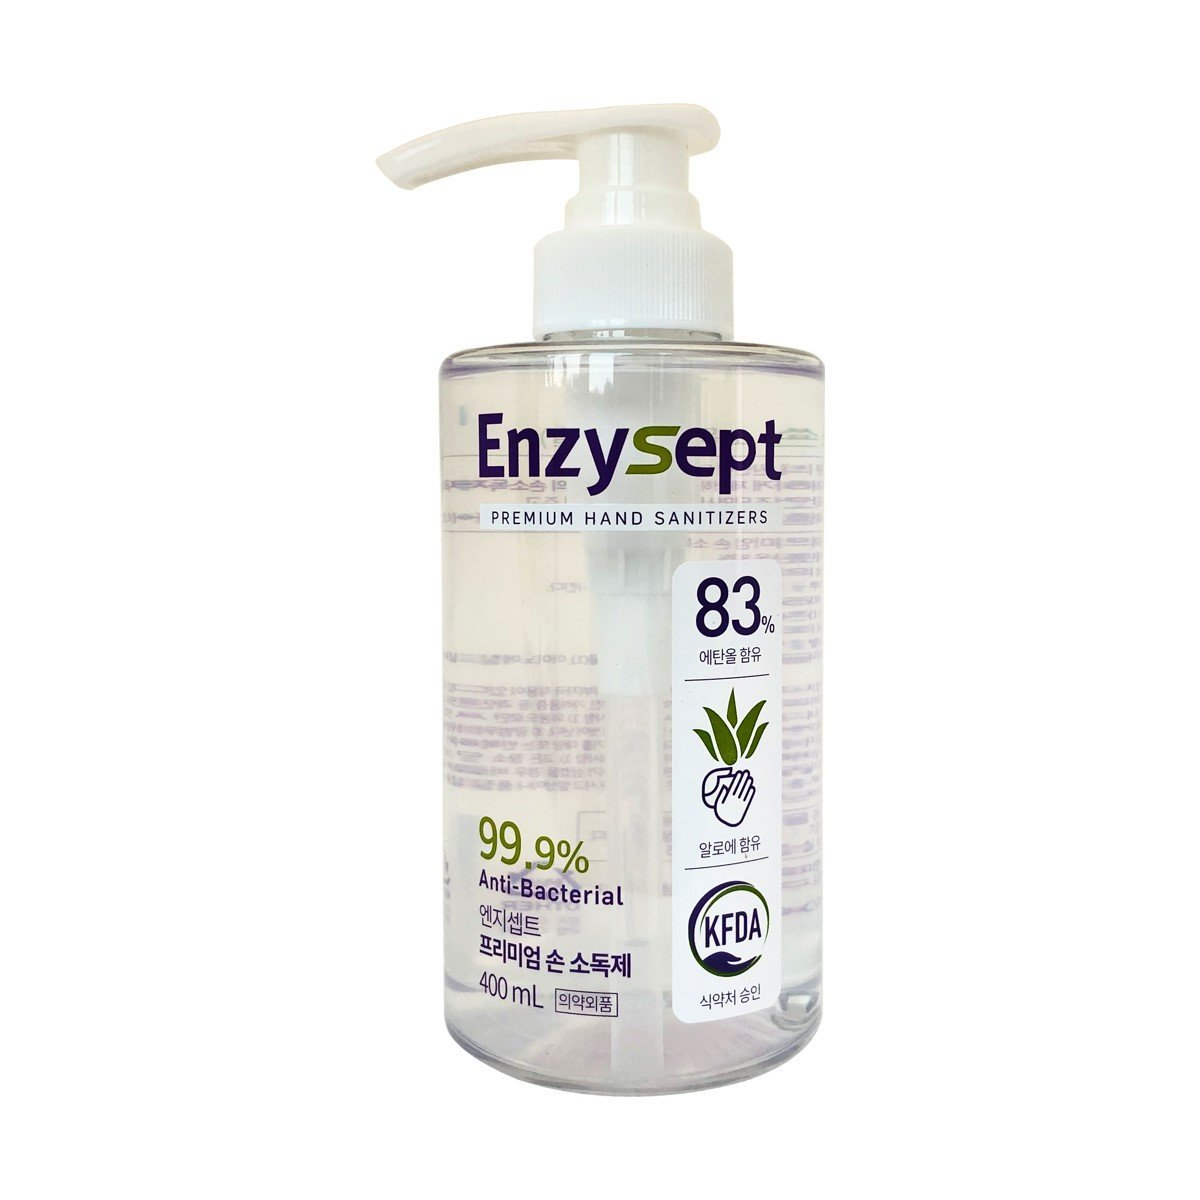 Enzysept 免沖洗酒精(83%)搓手液 (含蘆薈成份) 400ml